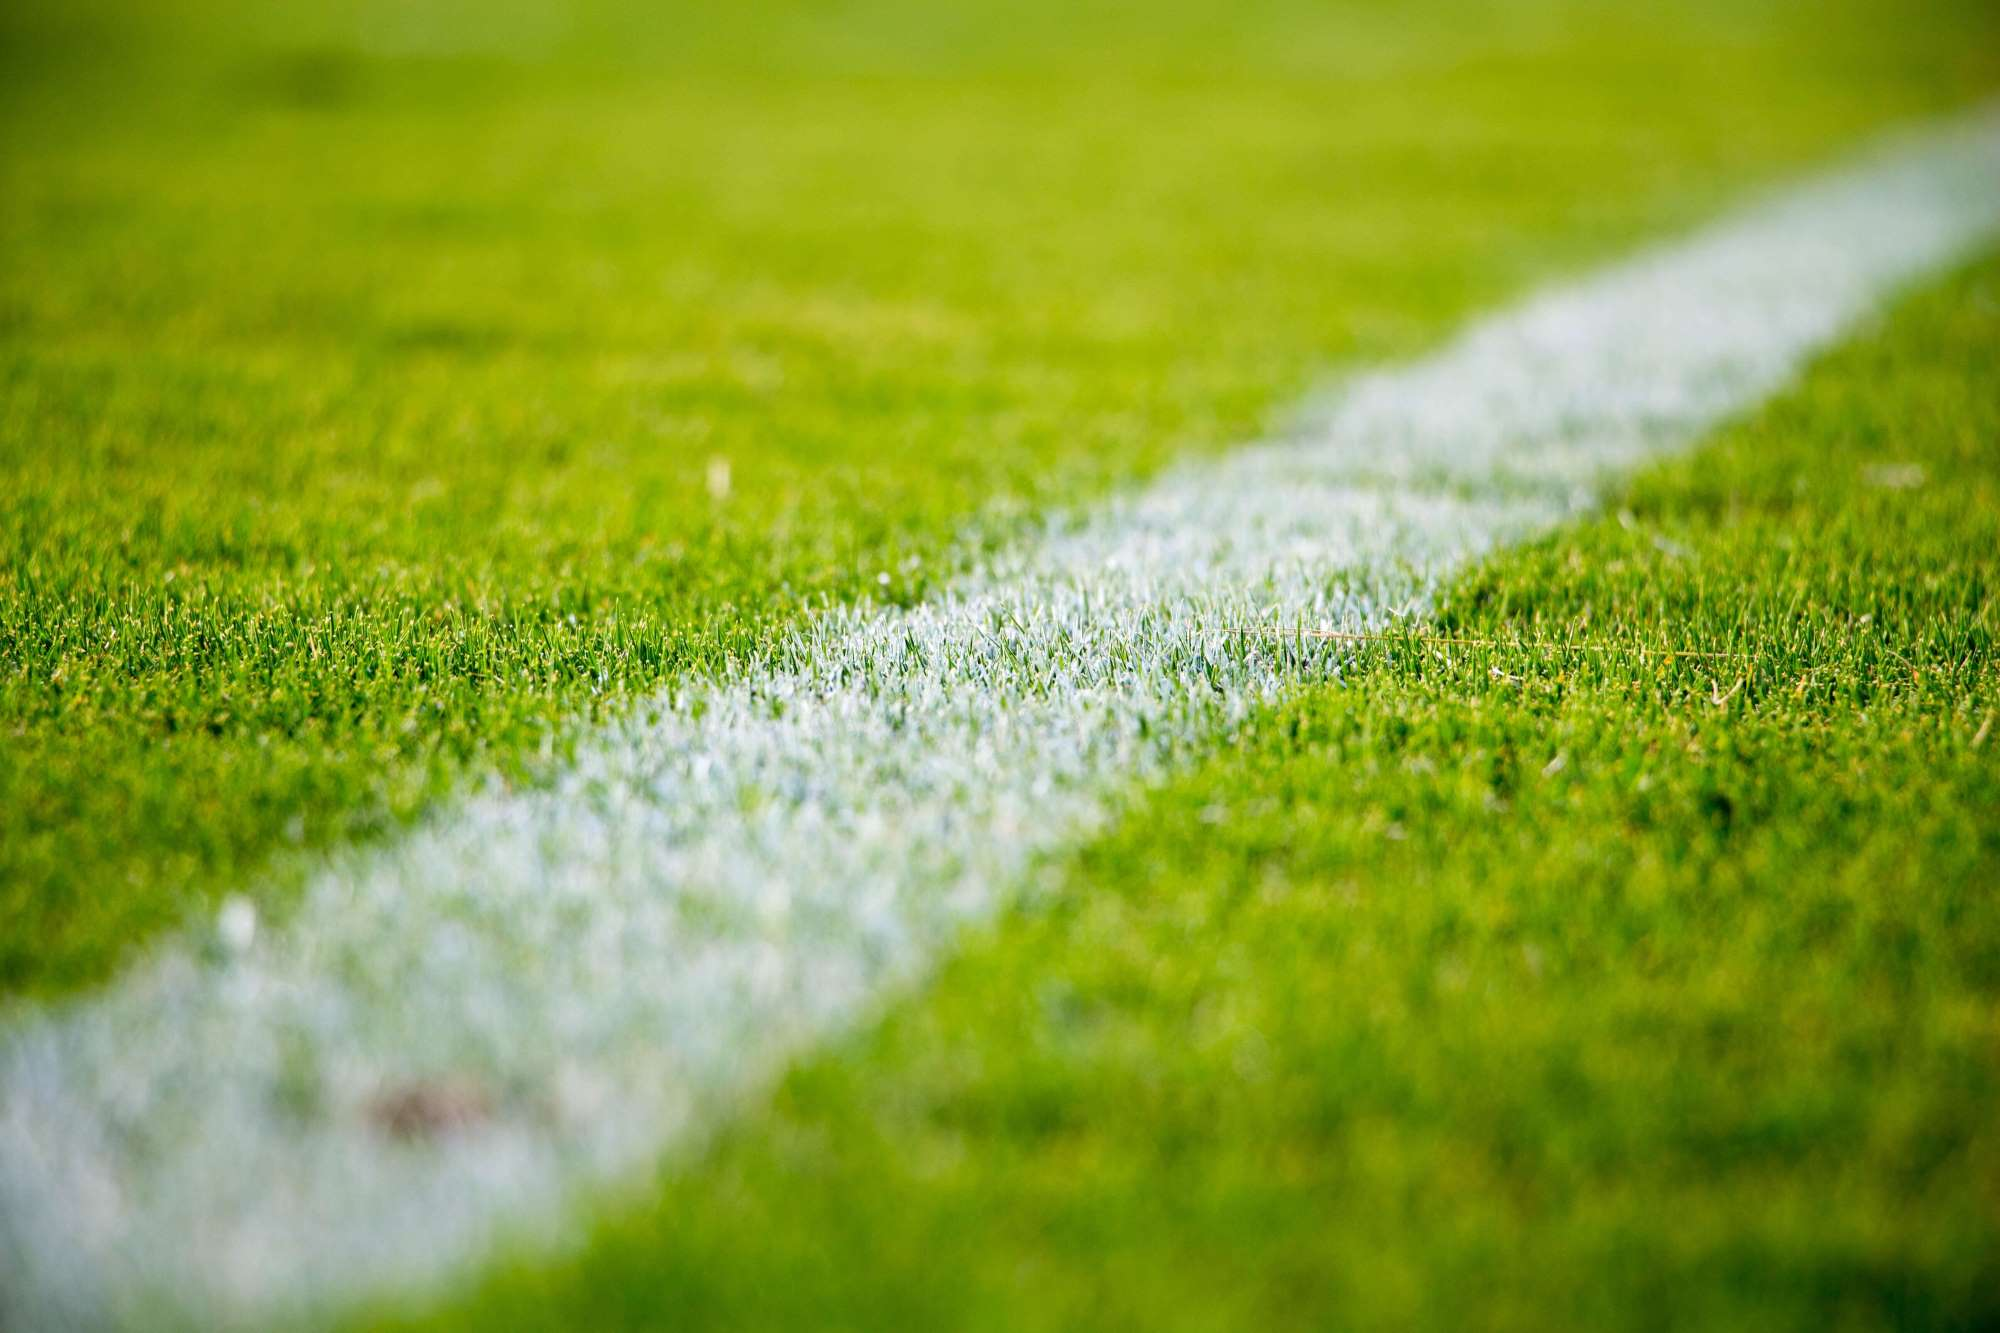 Soccer Foul Line on Turf